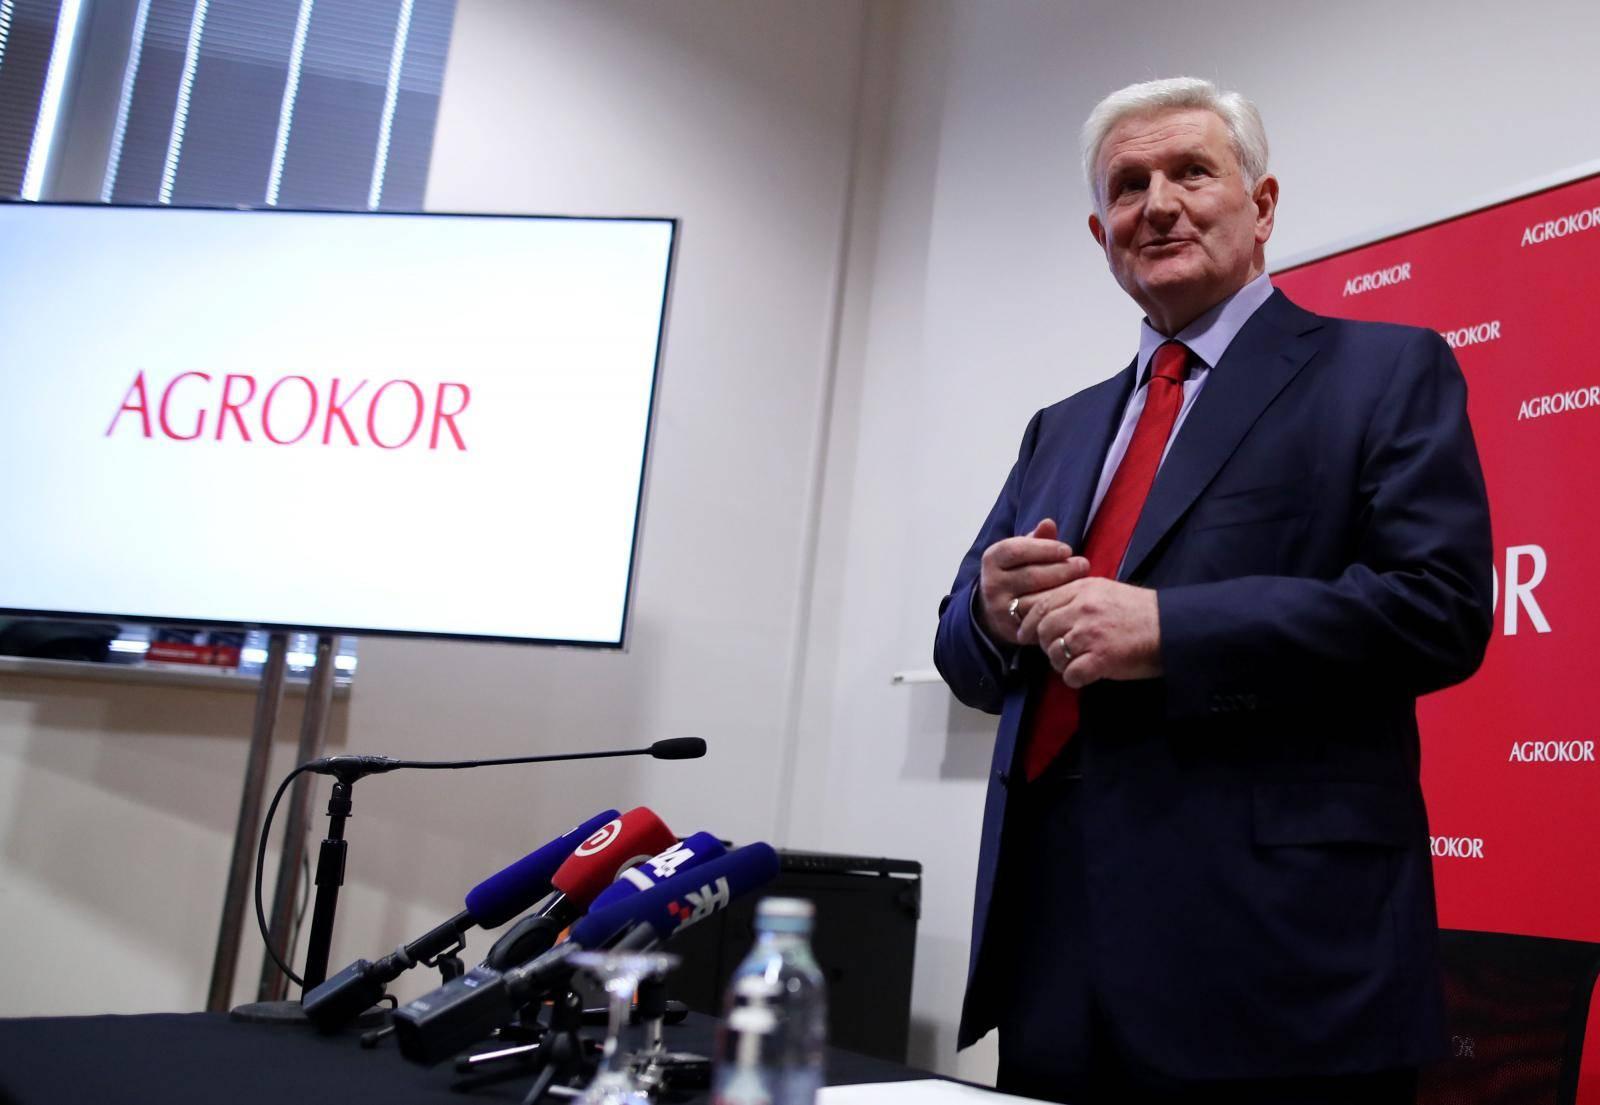 Tužiteljstvo produžilo rok za odluku o optužnici za Agrokor